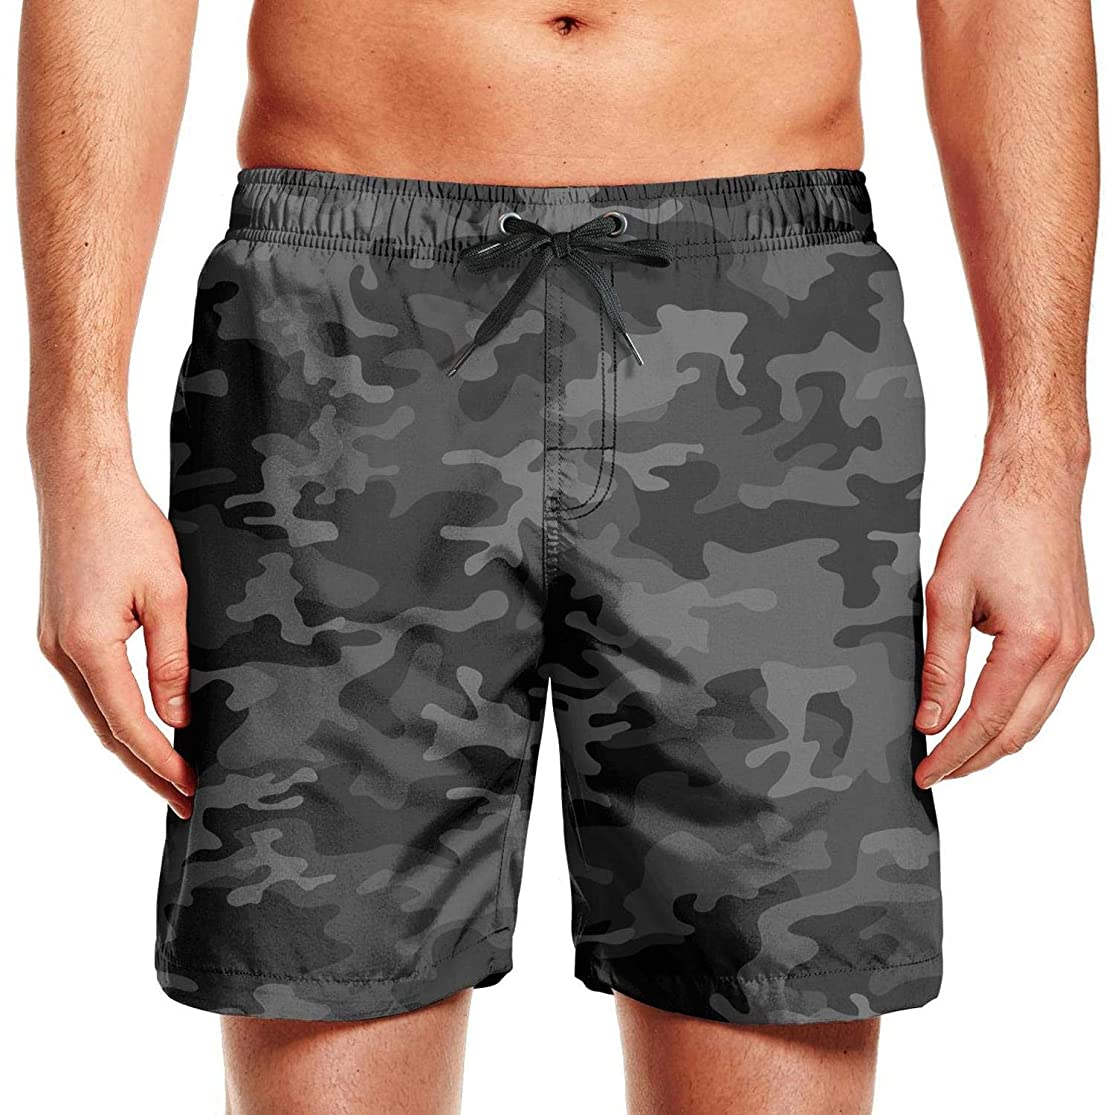 NC/Ball Men's Swimming Trunks Beach Board Shorts Pocket Quick Dry Colorful Tropical Short Pants Beachwear idauhruf7